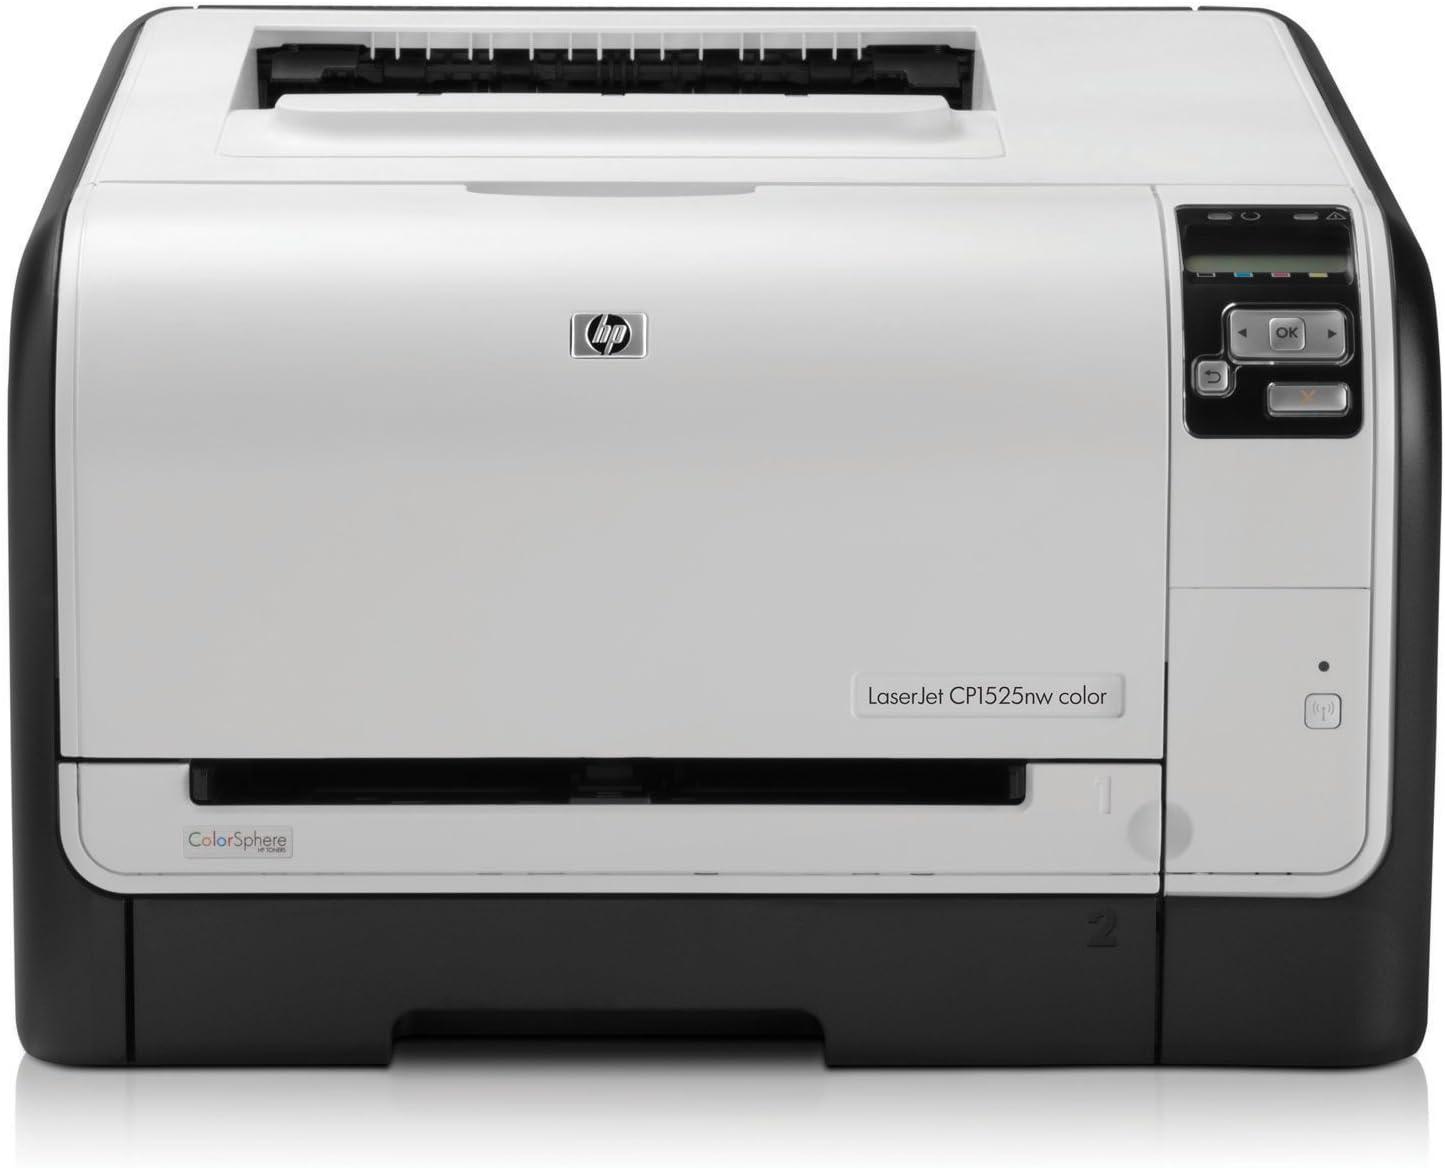 HP LaserJet Pro Color CP1525nw - Impresora láser color (12 ppm, A4 ...